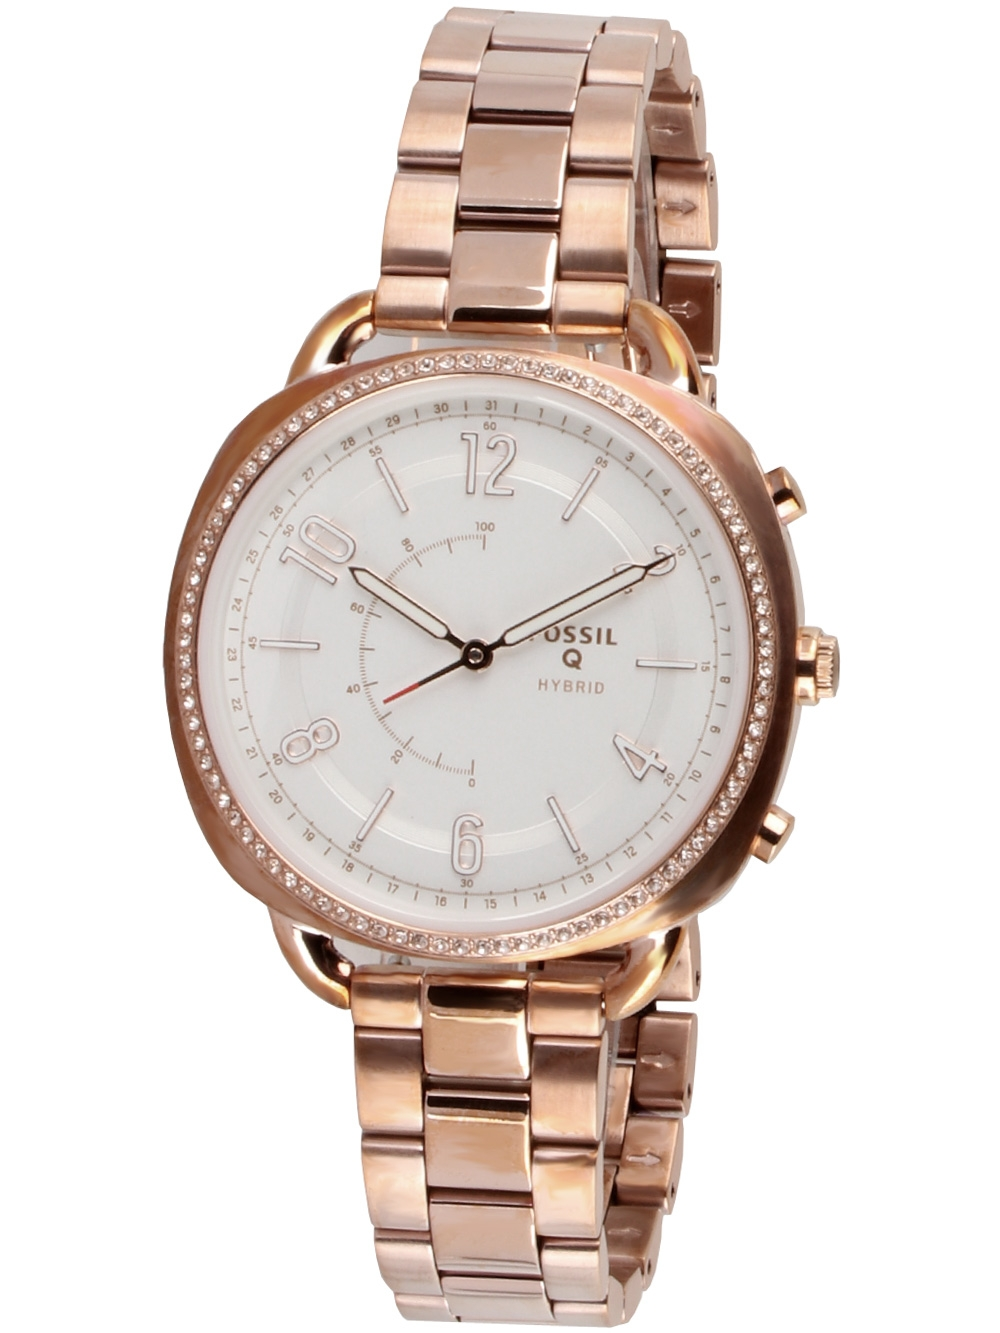 Q FTW1208 Accomplice Damen Hybrid Smartwatch 40mm 3ATM